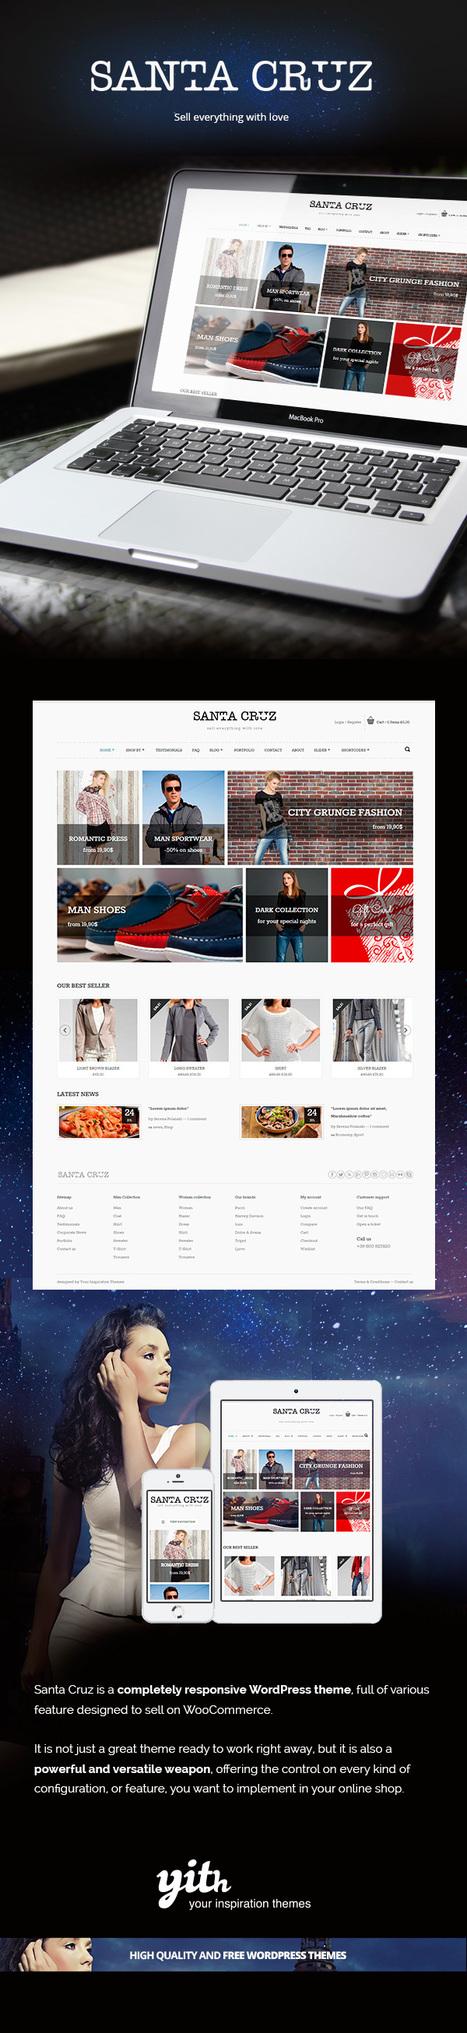 Santa Cruz – Free ecommerce responsive wp  theme | wordpresstemplates | Scoop.it